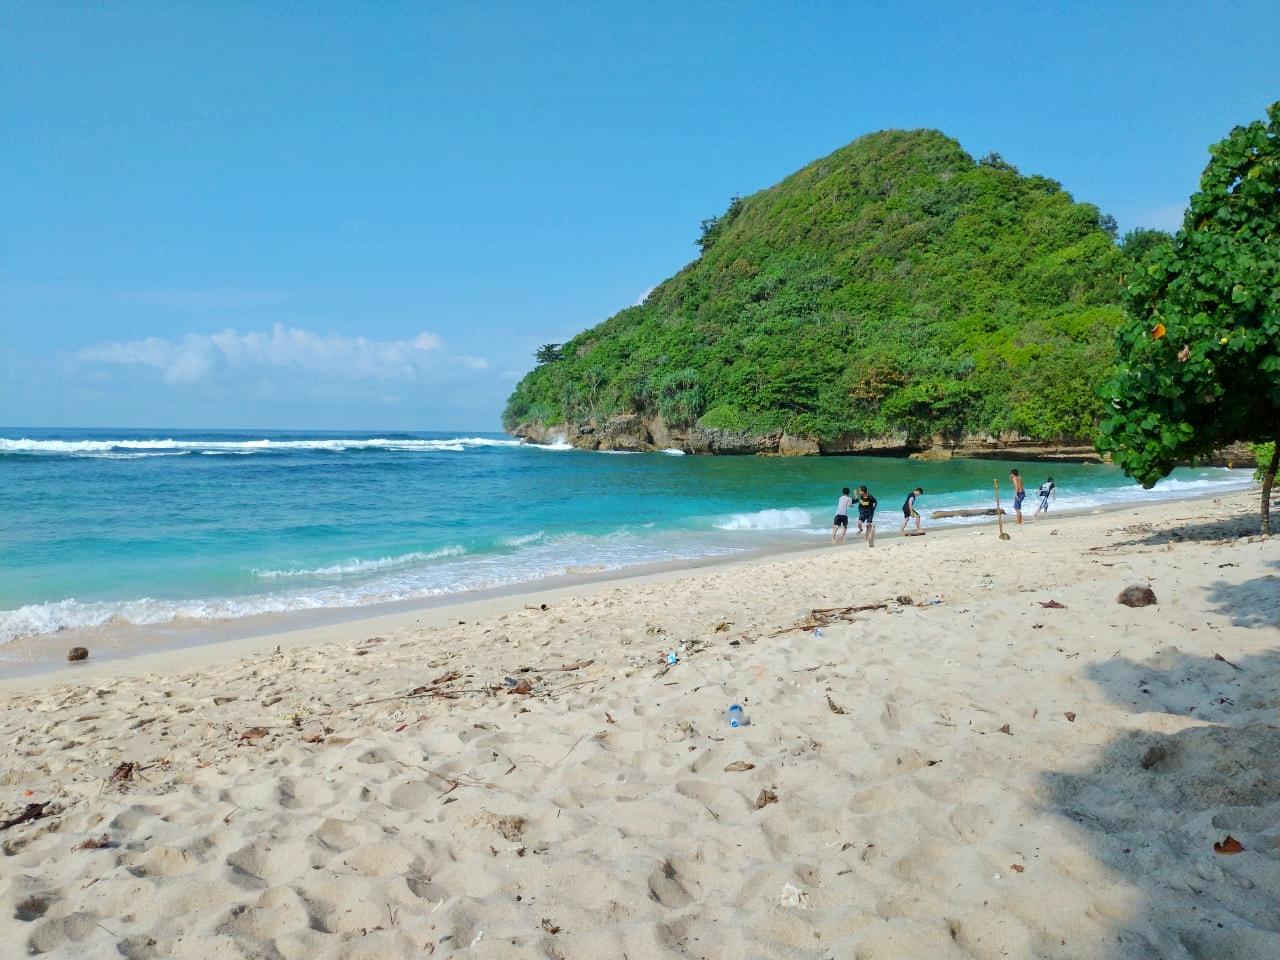 Pantai Teluk Asmara, Bukti Kecantikan Pantai Malang Selatan Yang Nggak Ada Habisnya